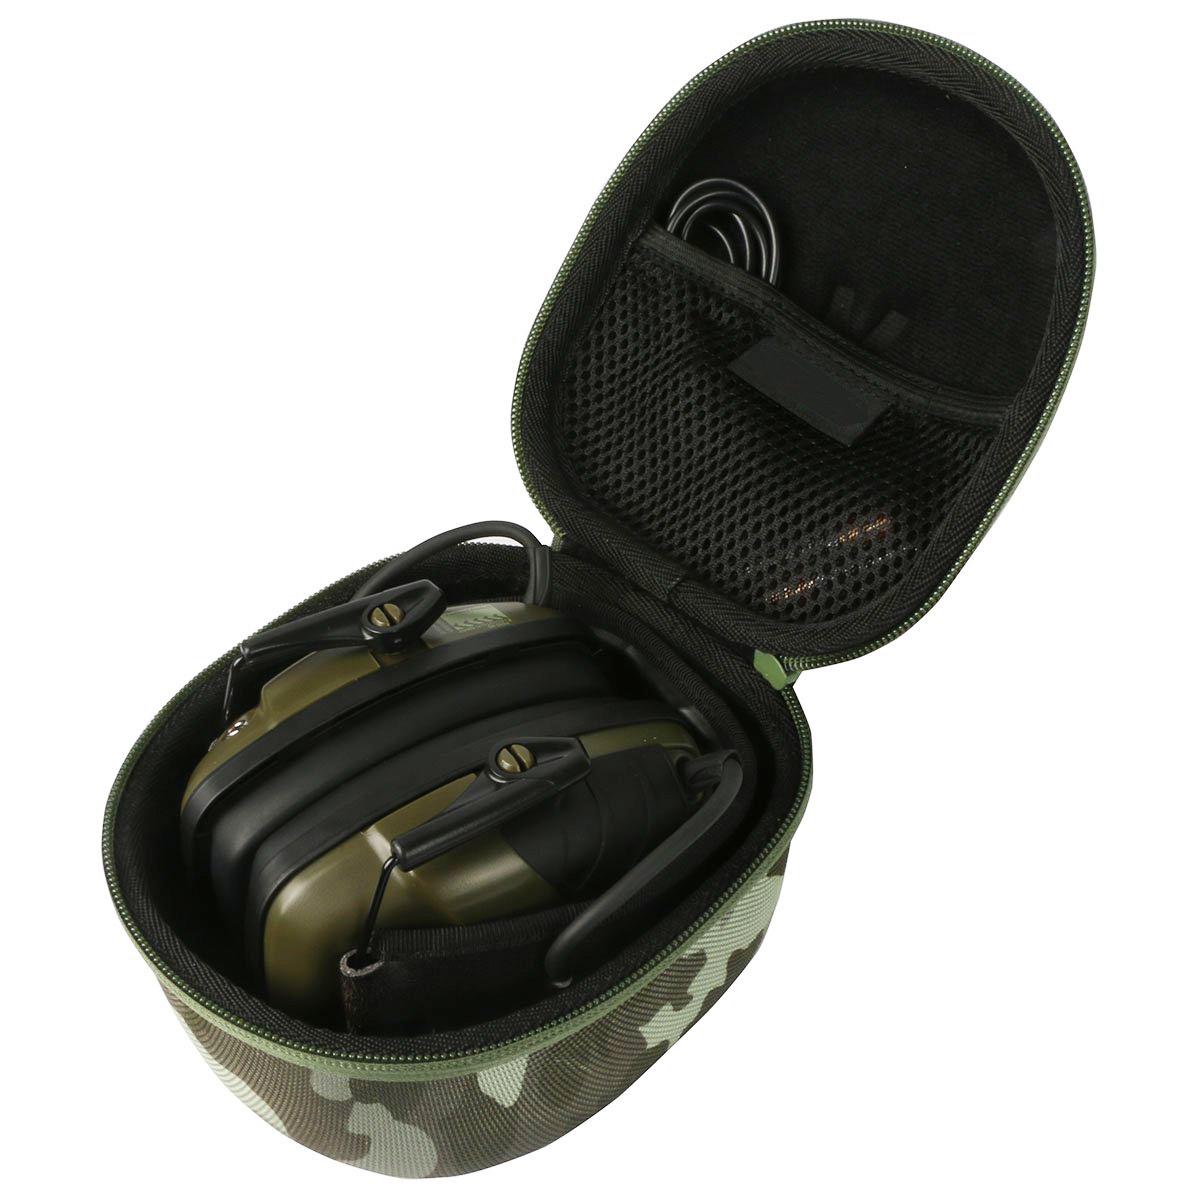 EVA Hard Shell Bag Tool Bag/EVA Carrying Storage Travel Hard Case Cover Bag for Howard Leight Impact Sport Od Electric Folding Earmuff. - Velcro Mesh